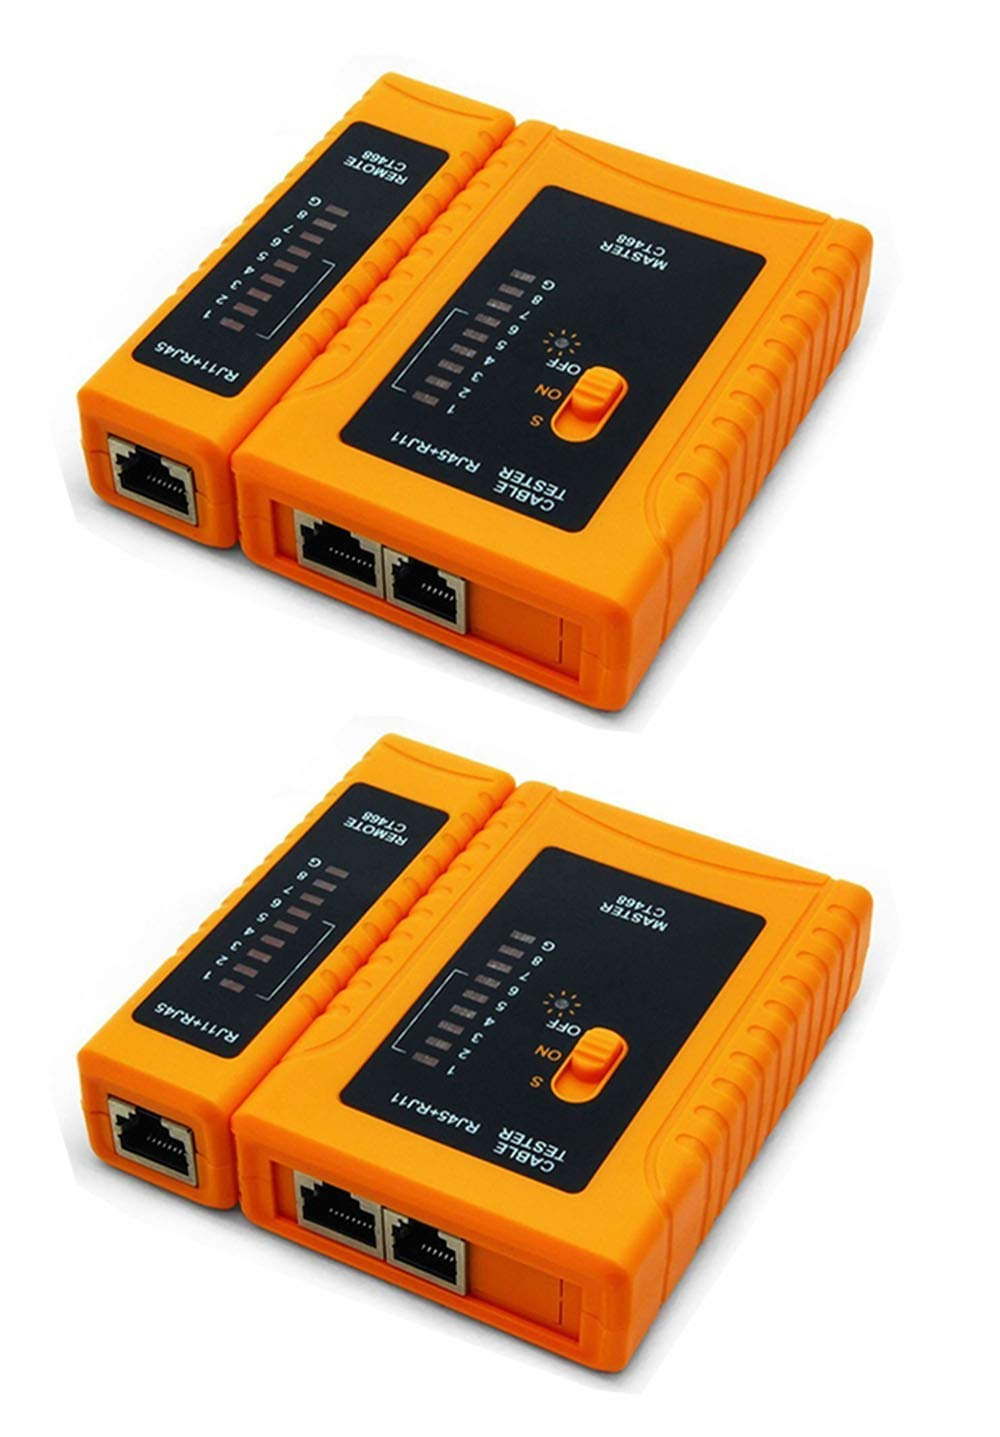 iMBAPrice (Pack of 2) RJ45/RJ11/RJ12/CAT5/CAT6/ UTP Network LAN Cable Tester Test Tool by iMBAPrice